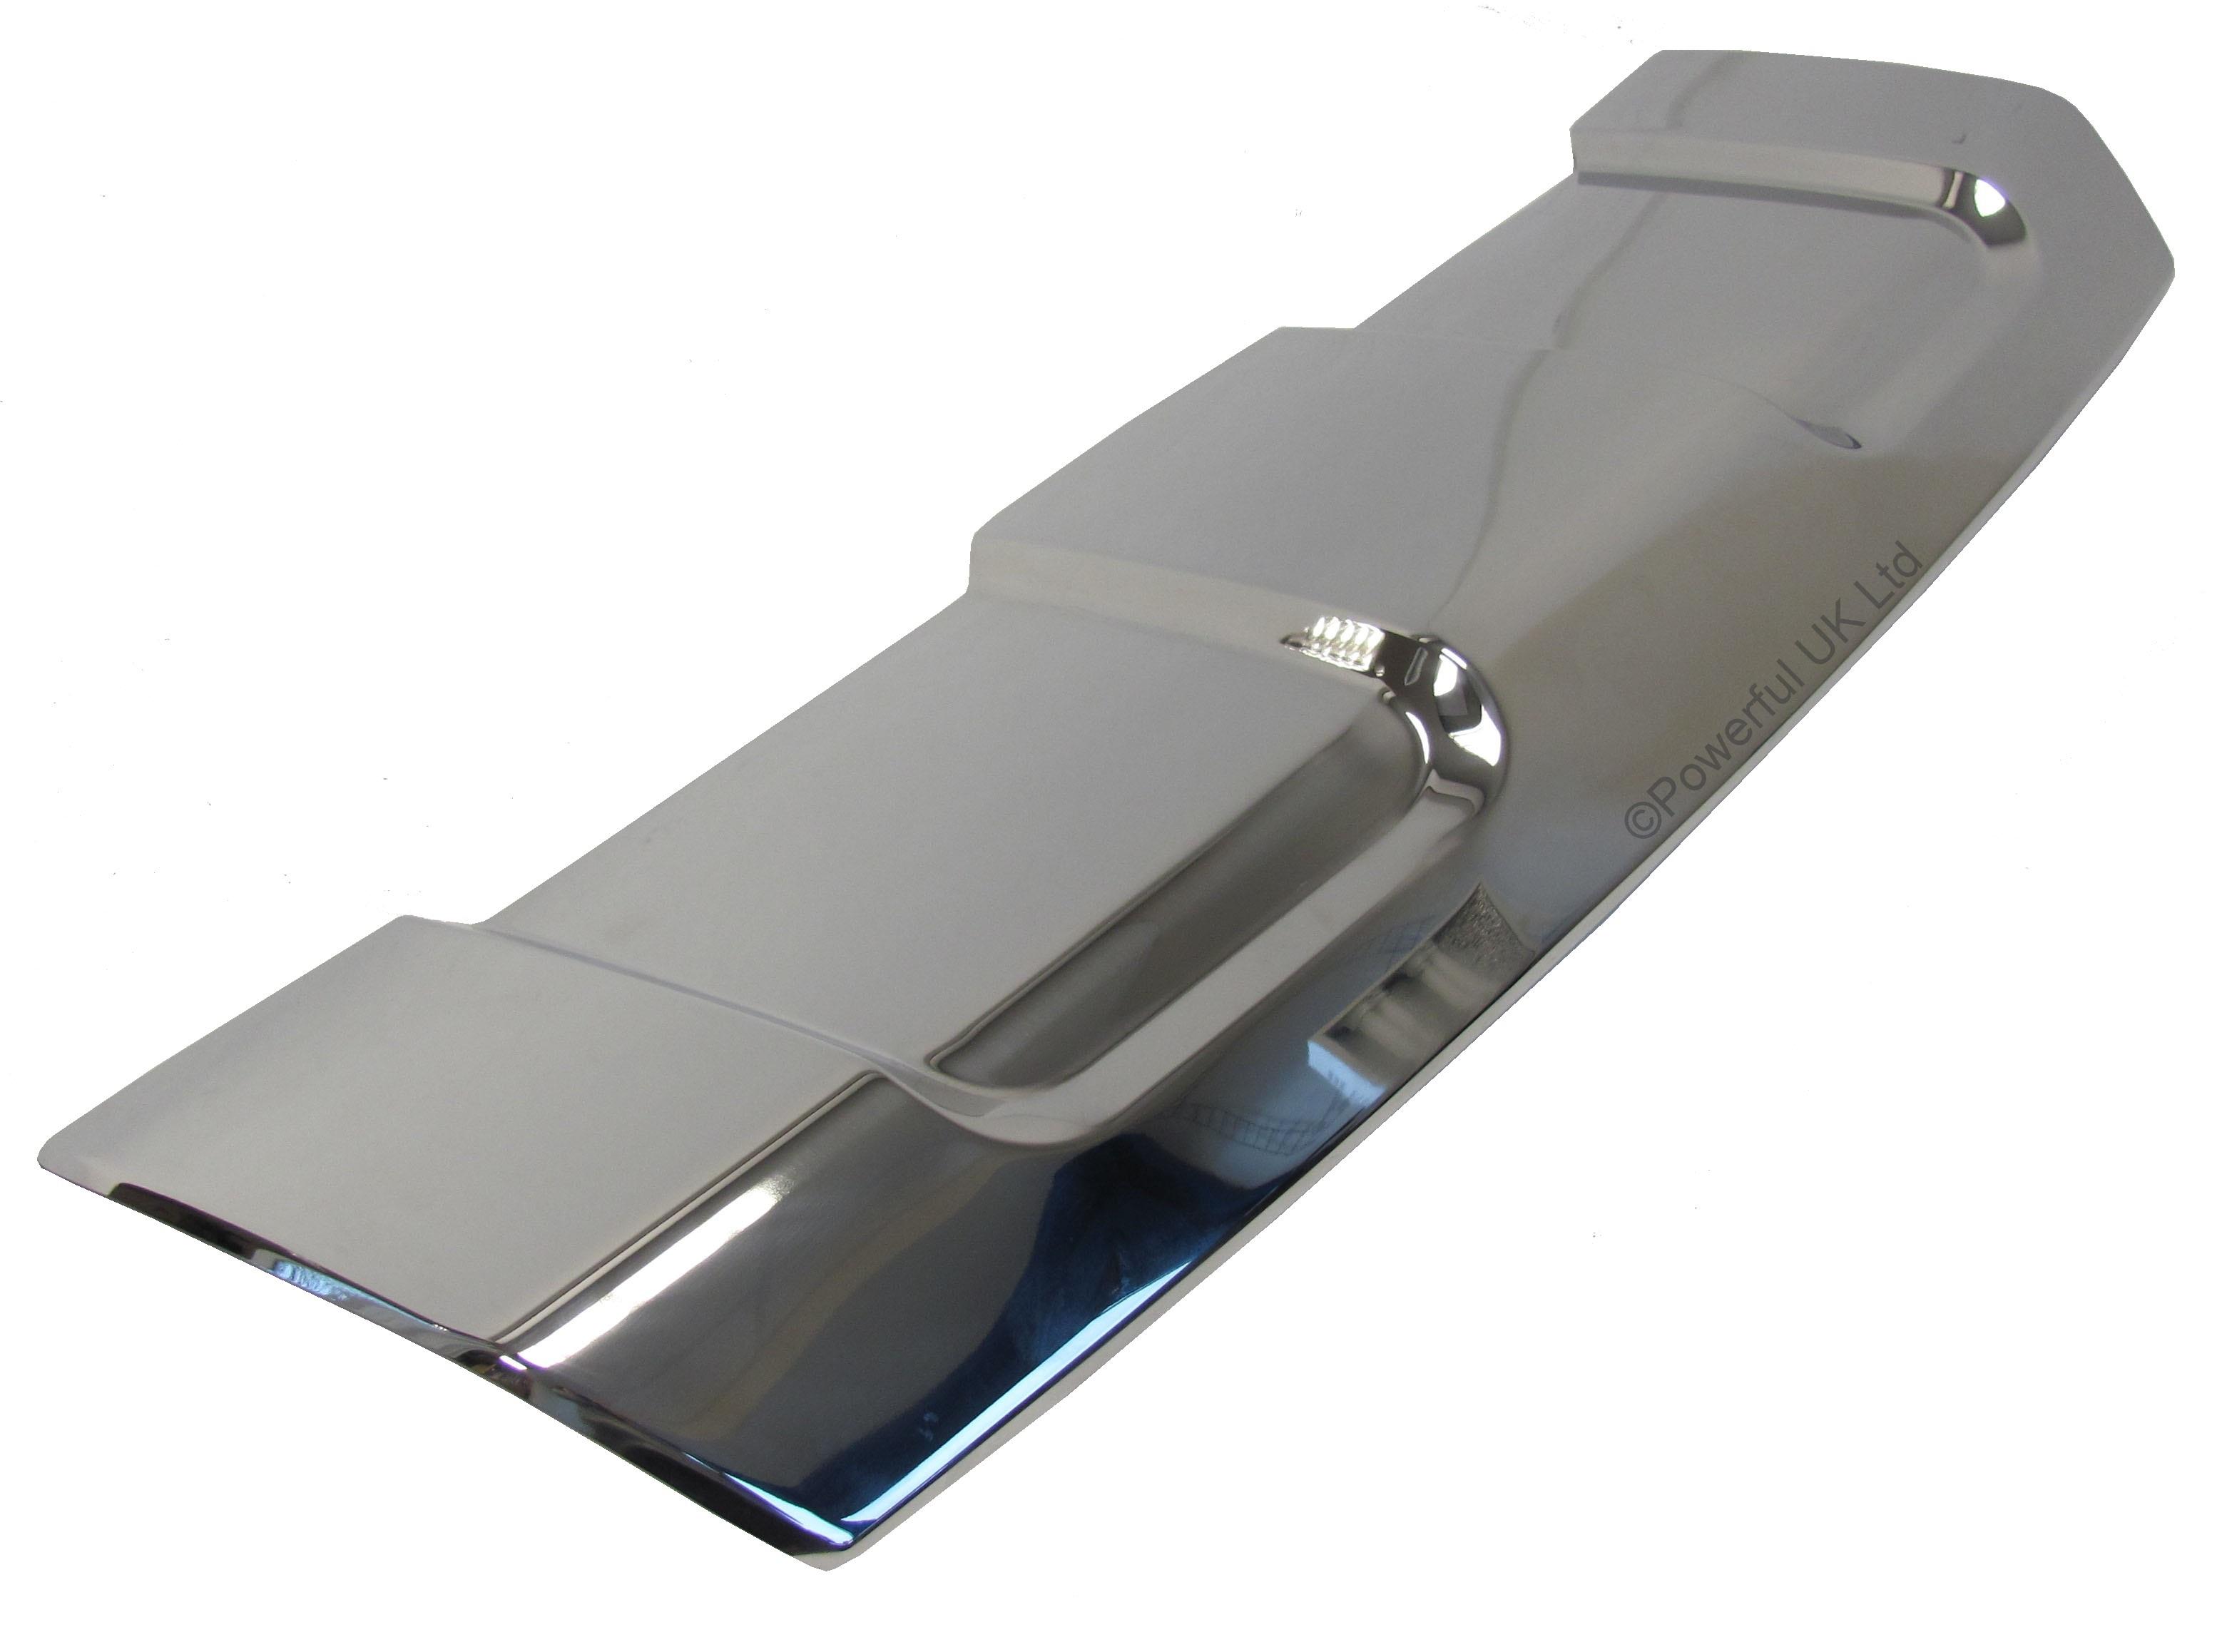 stainless steel front bumper skid plate for new range rover sport 2013 l494 ebay. Black Bedroom Furniture Sets. Home Design Ideas